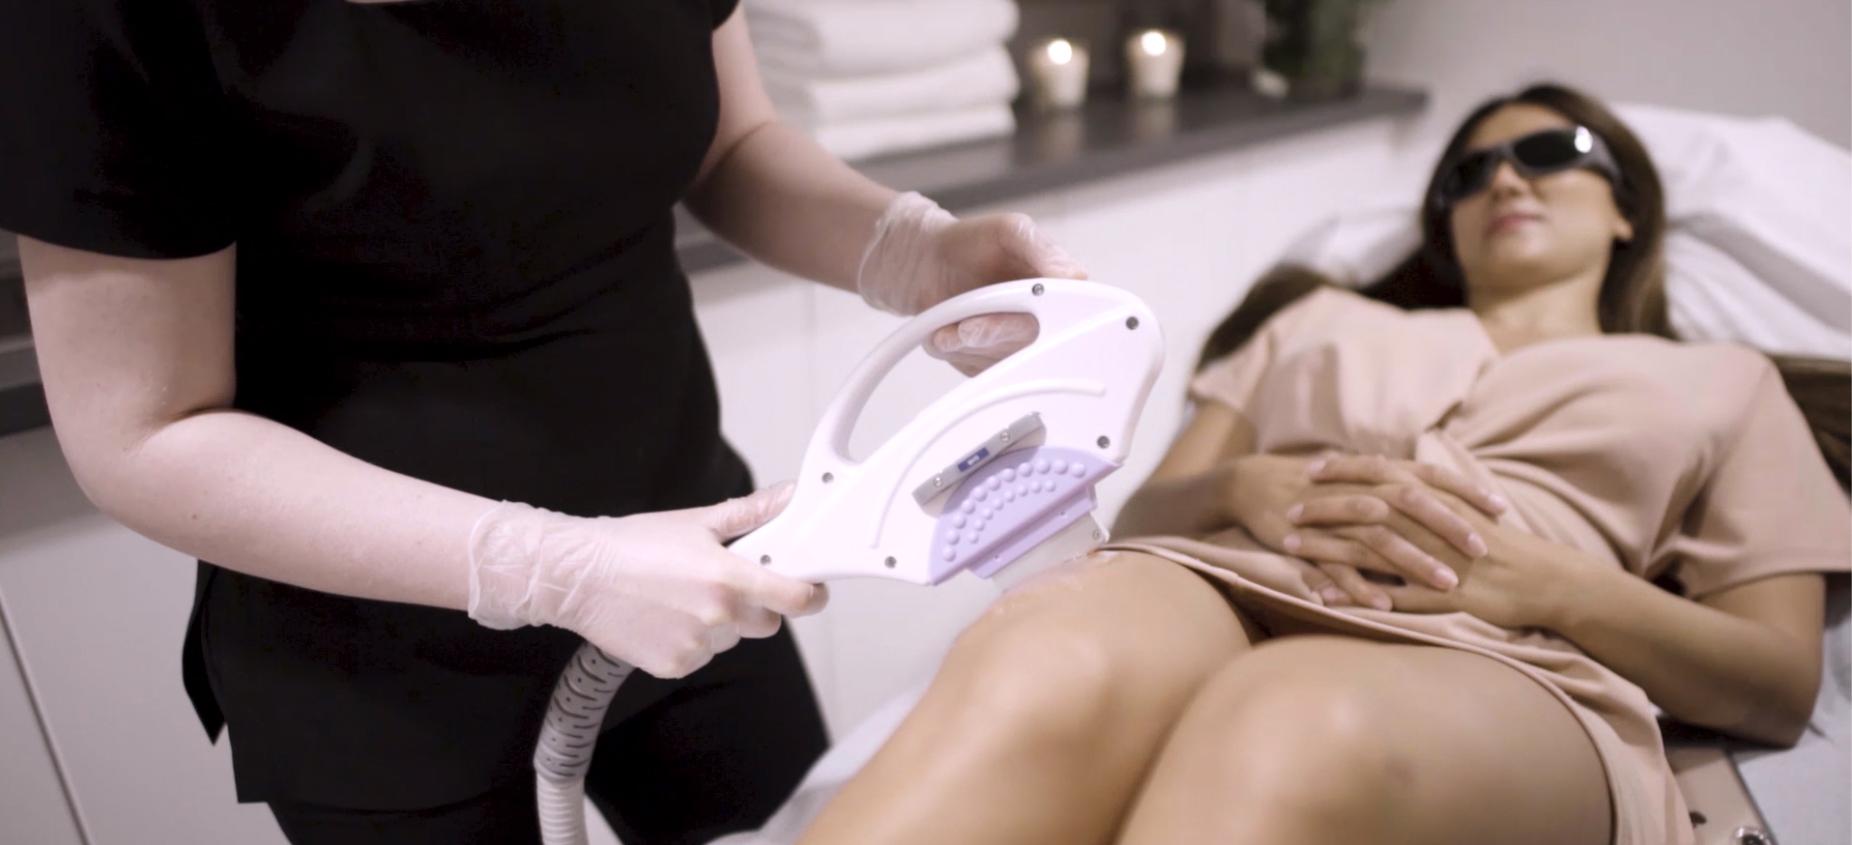 biocare-lite hair removal treatment beauty aesthetics